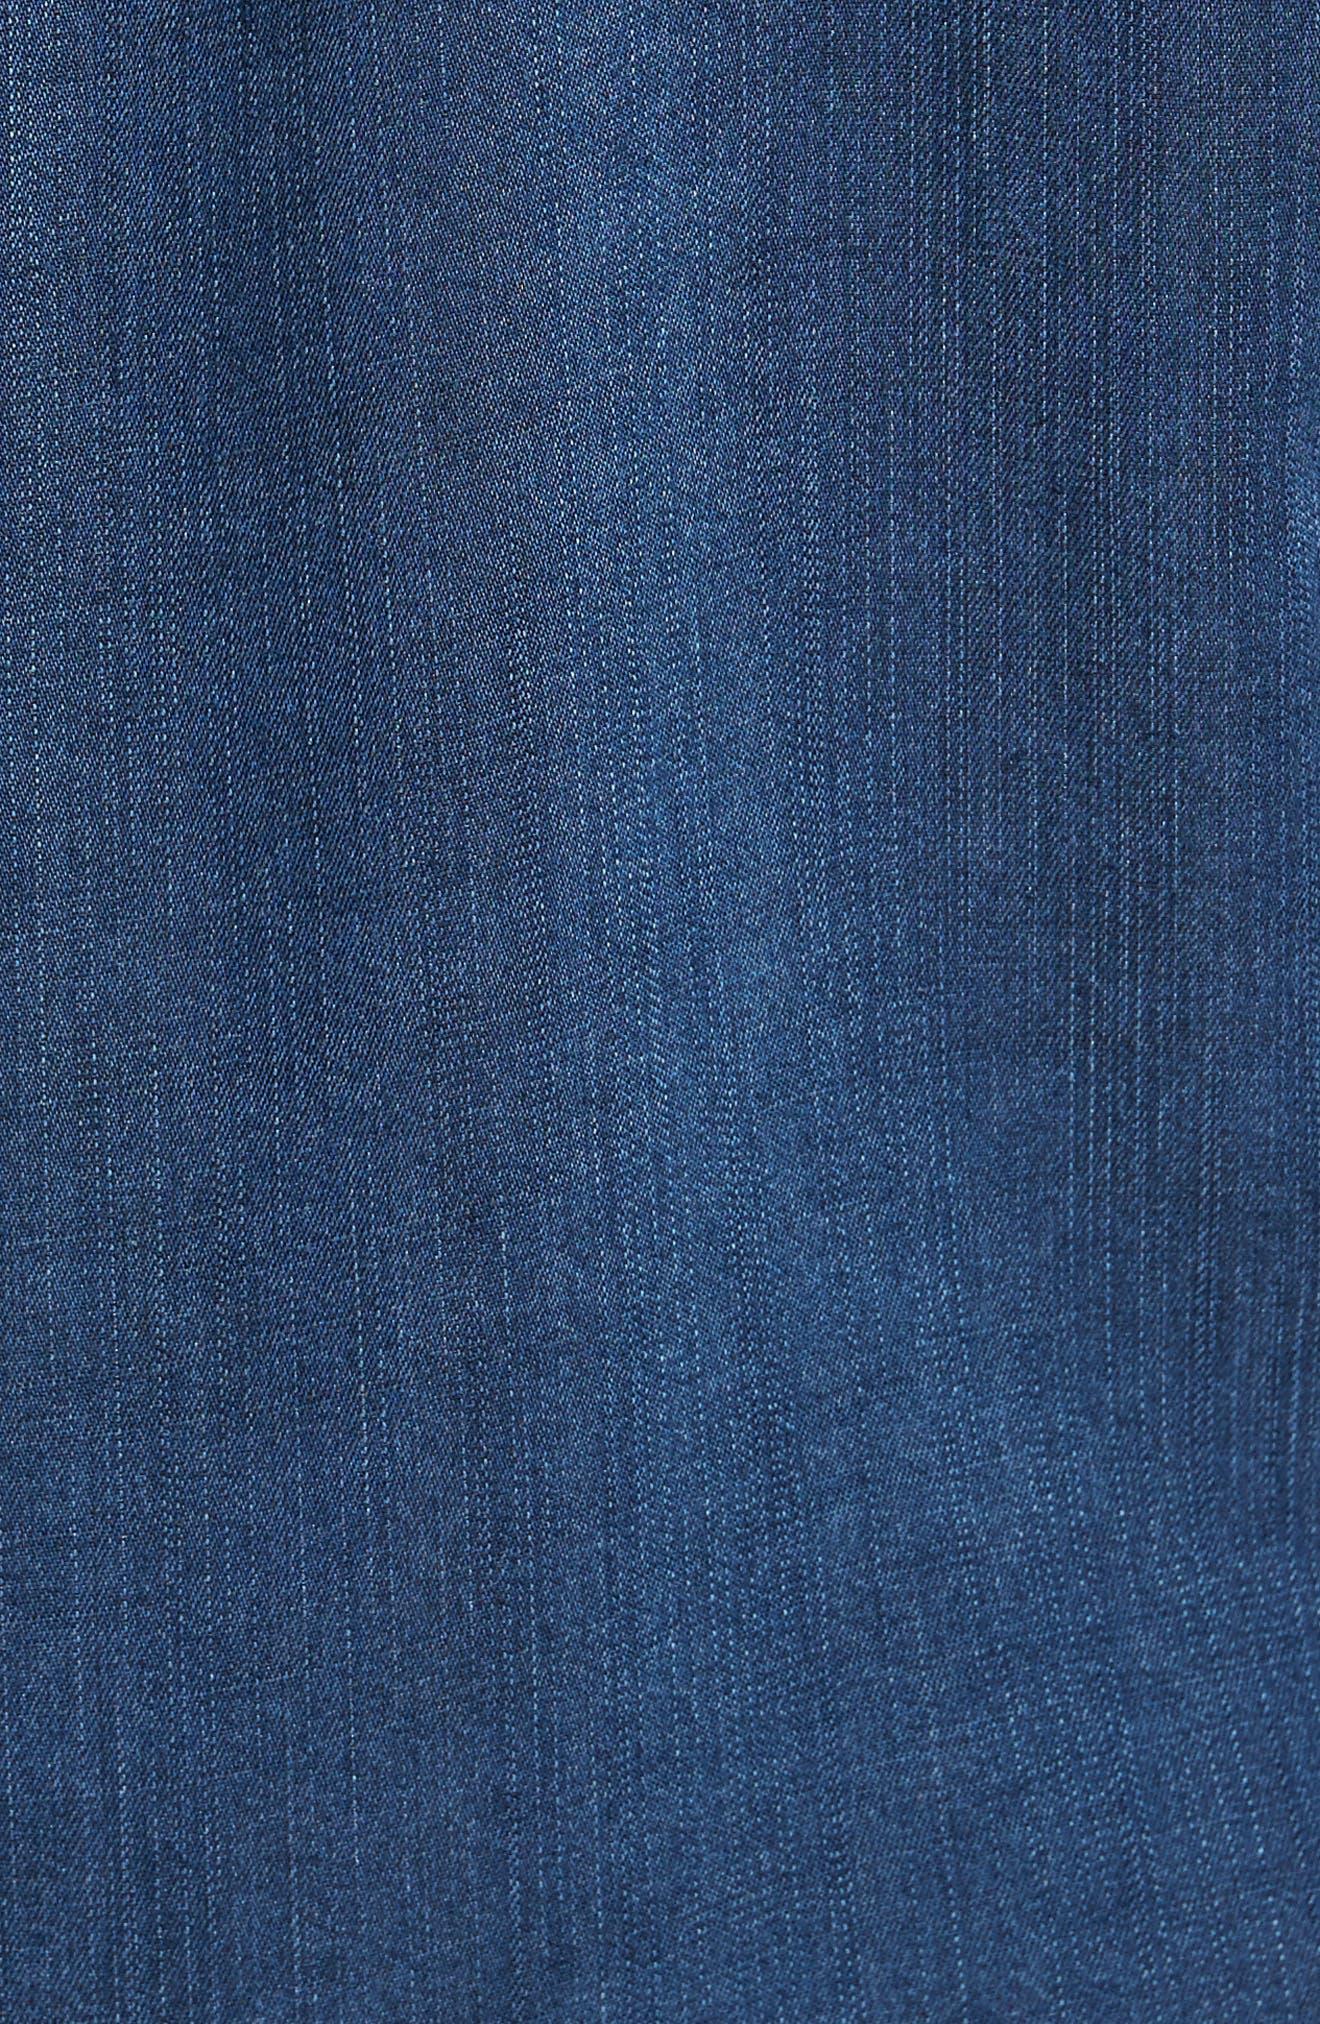 Beckford Denim Sport Shirt,                             Alternate thumbnail 5, color,                             Midnight Vintage